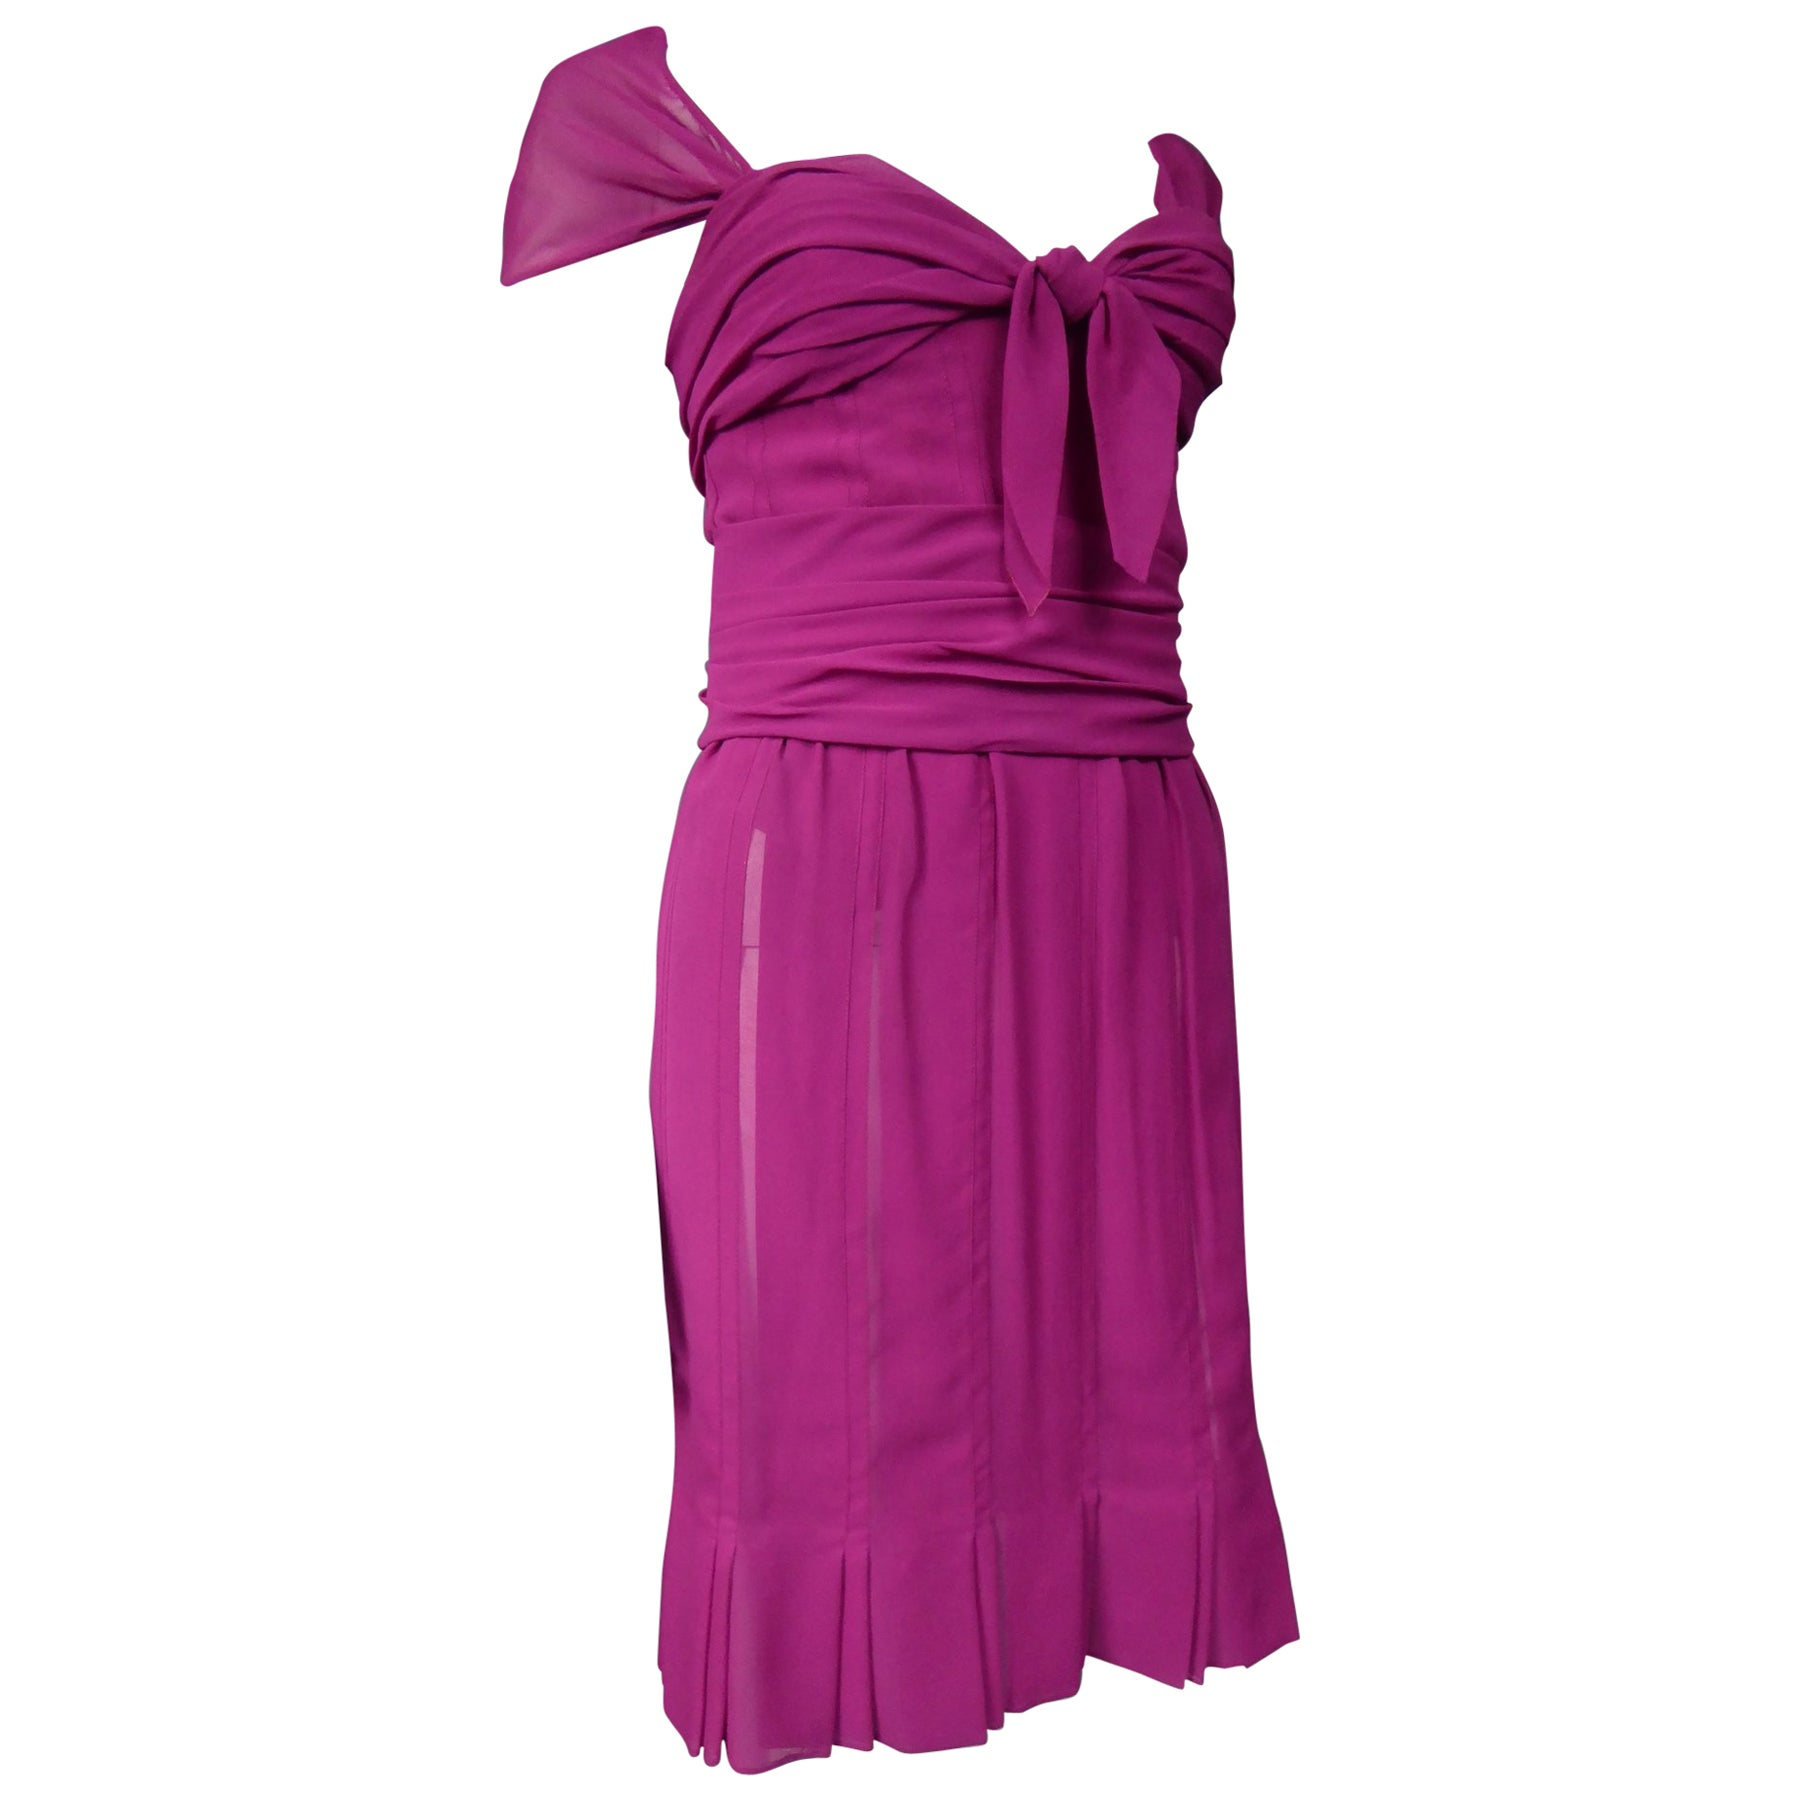 Christian Dior Haute Couture in pink chiffon silk dress, Circa 1989 - 1990